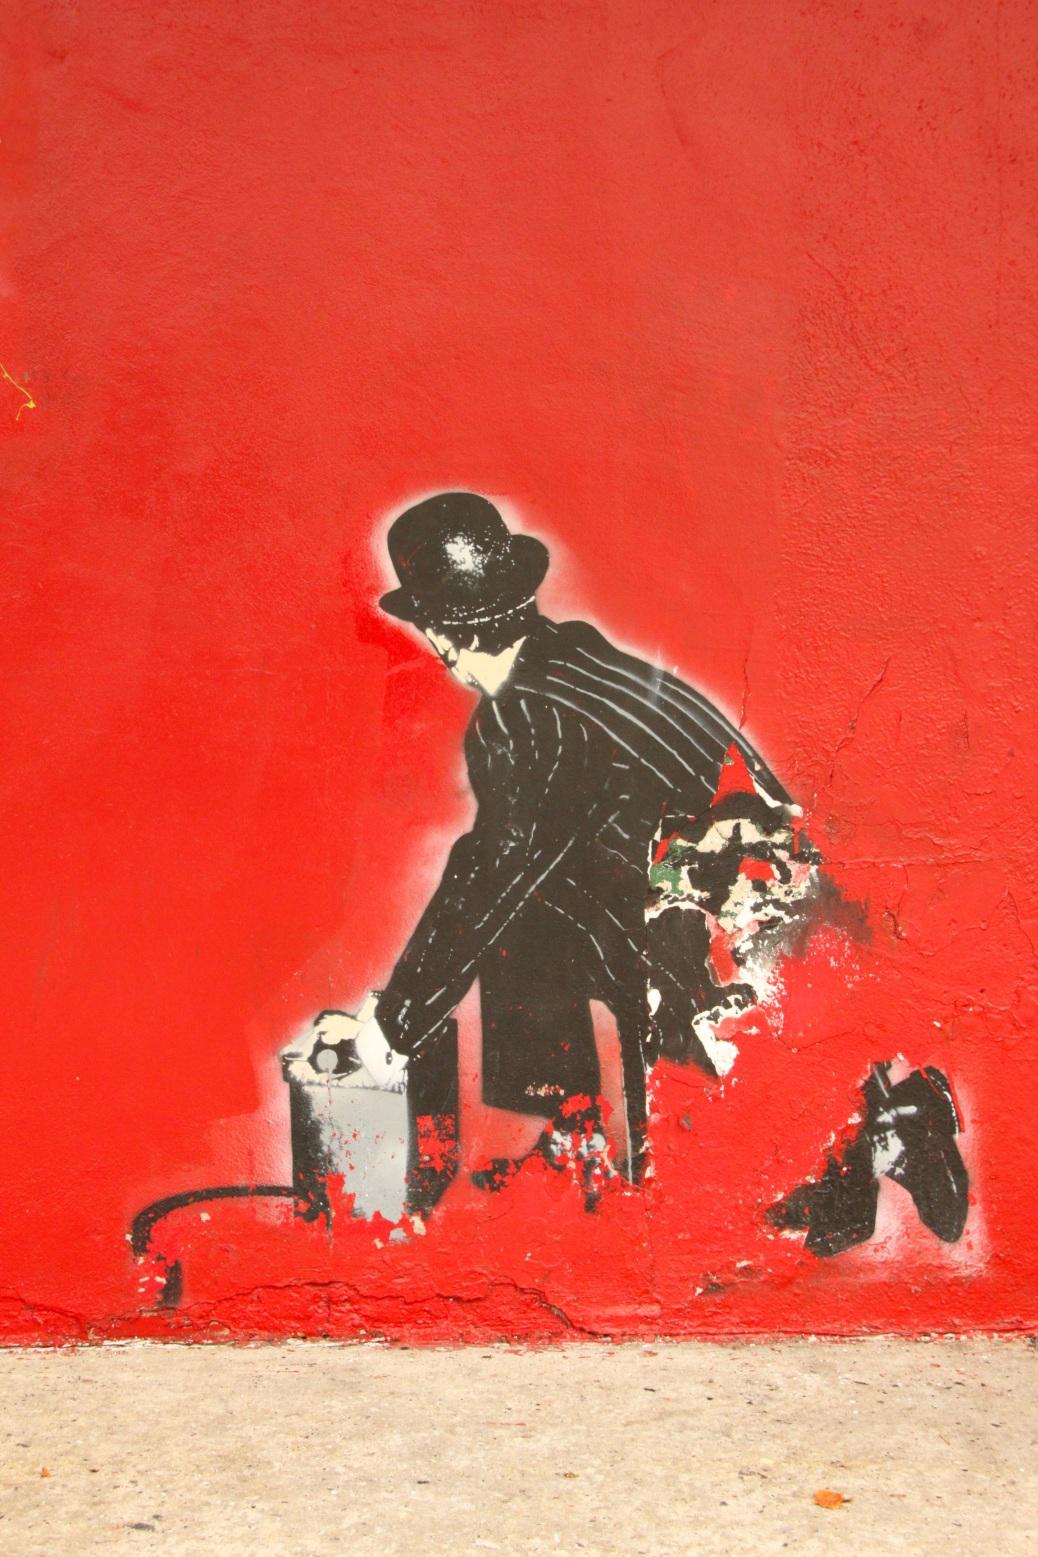 Graffiti NYC, Charlie Chaplin